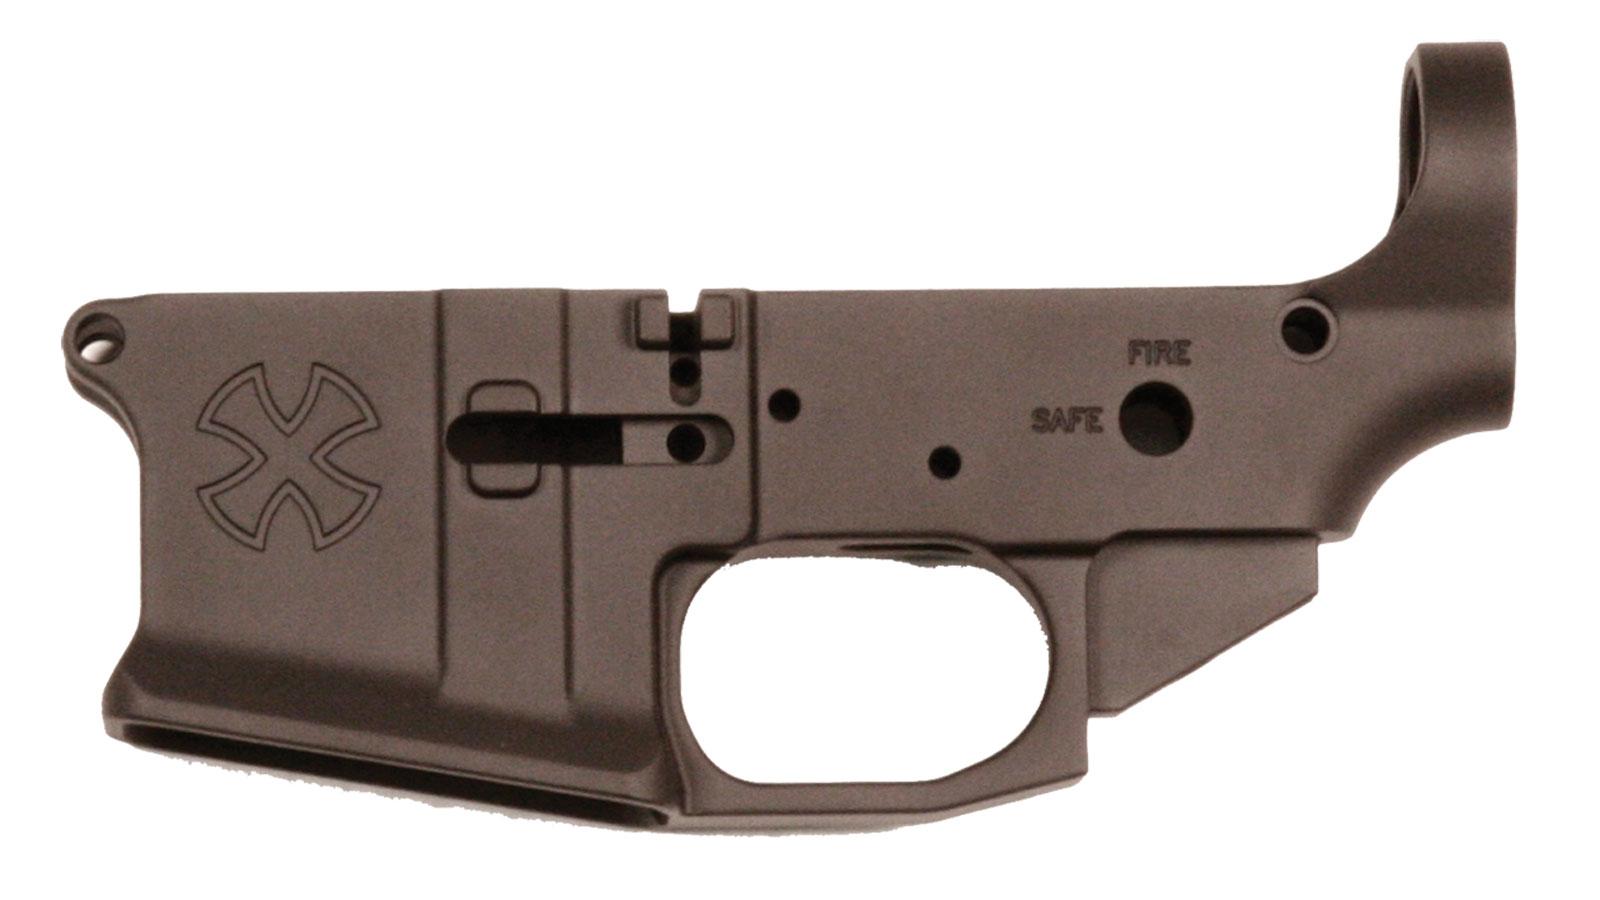 Noveske 04000008K AR-15 Stripped Lower Receiver Gen3 AR-15 Black Hardcoat Anodized